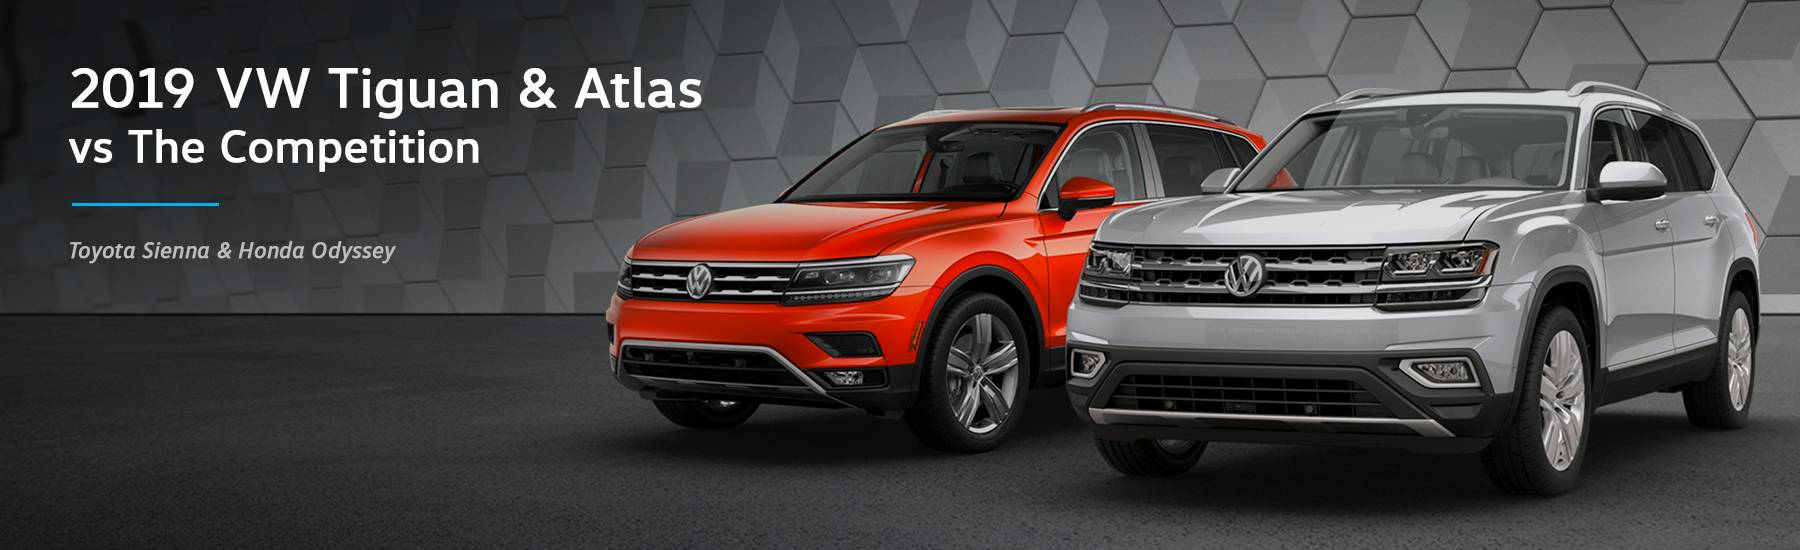 2019 VW Tiguan & 2019 VW Atlas vs Toyota Sienna & Honda Odyssey